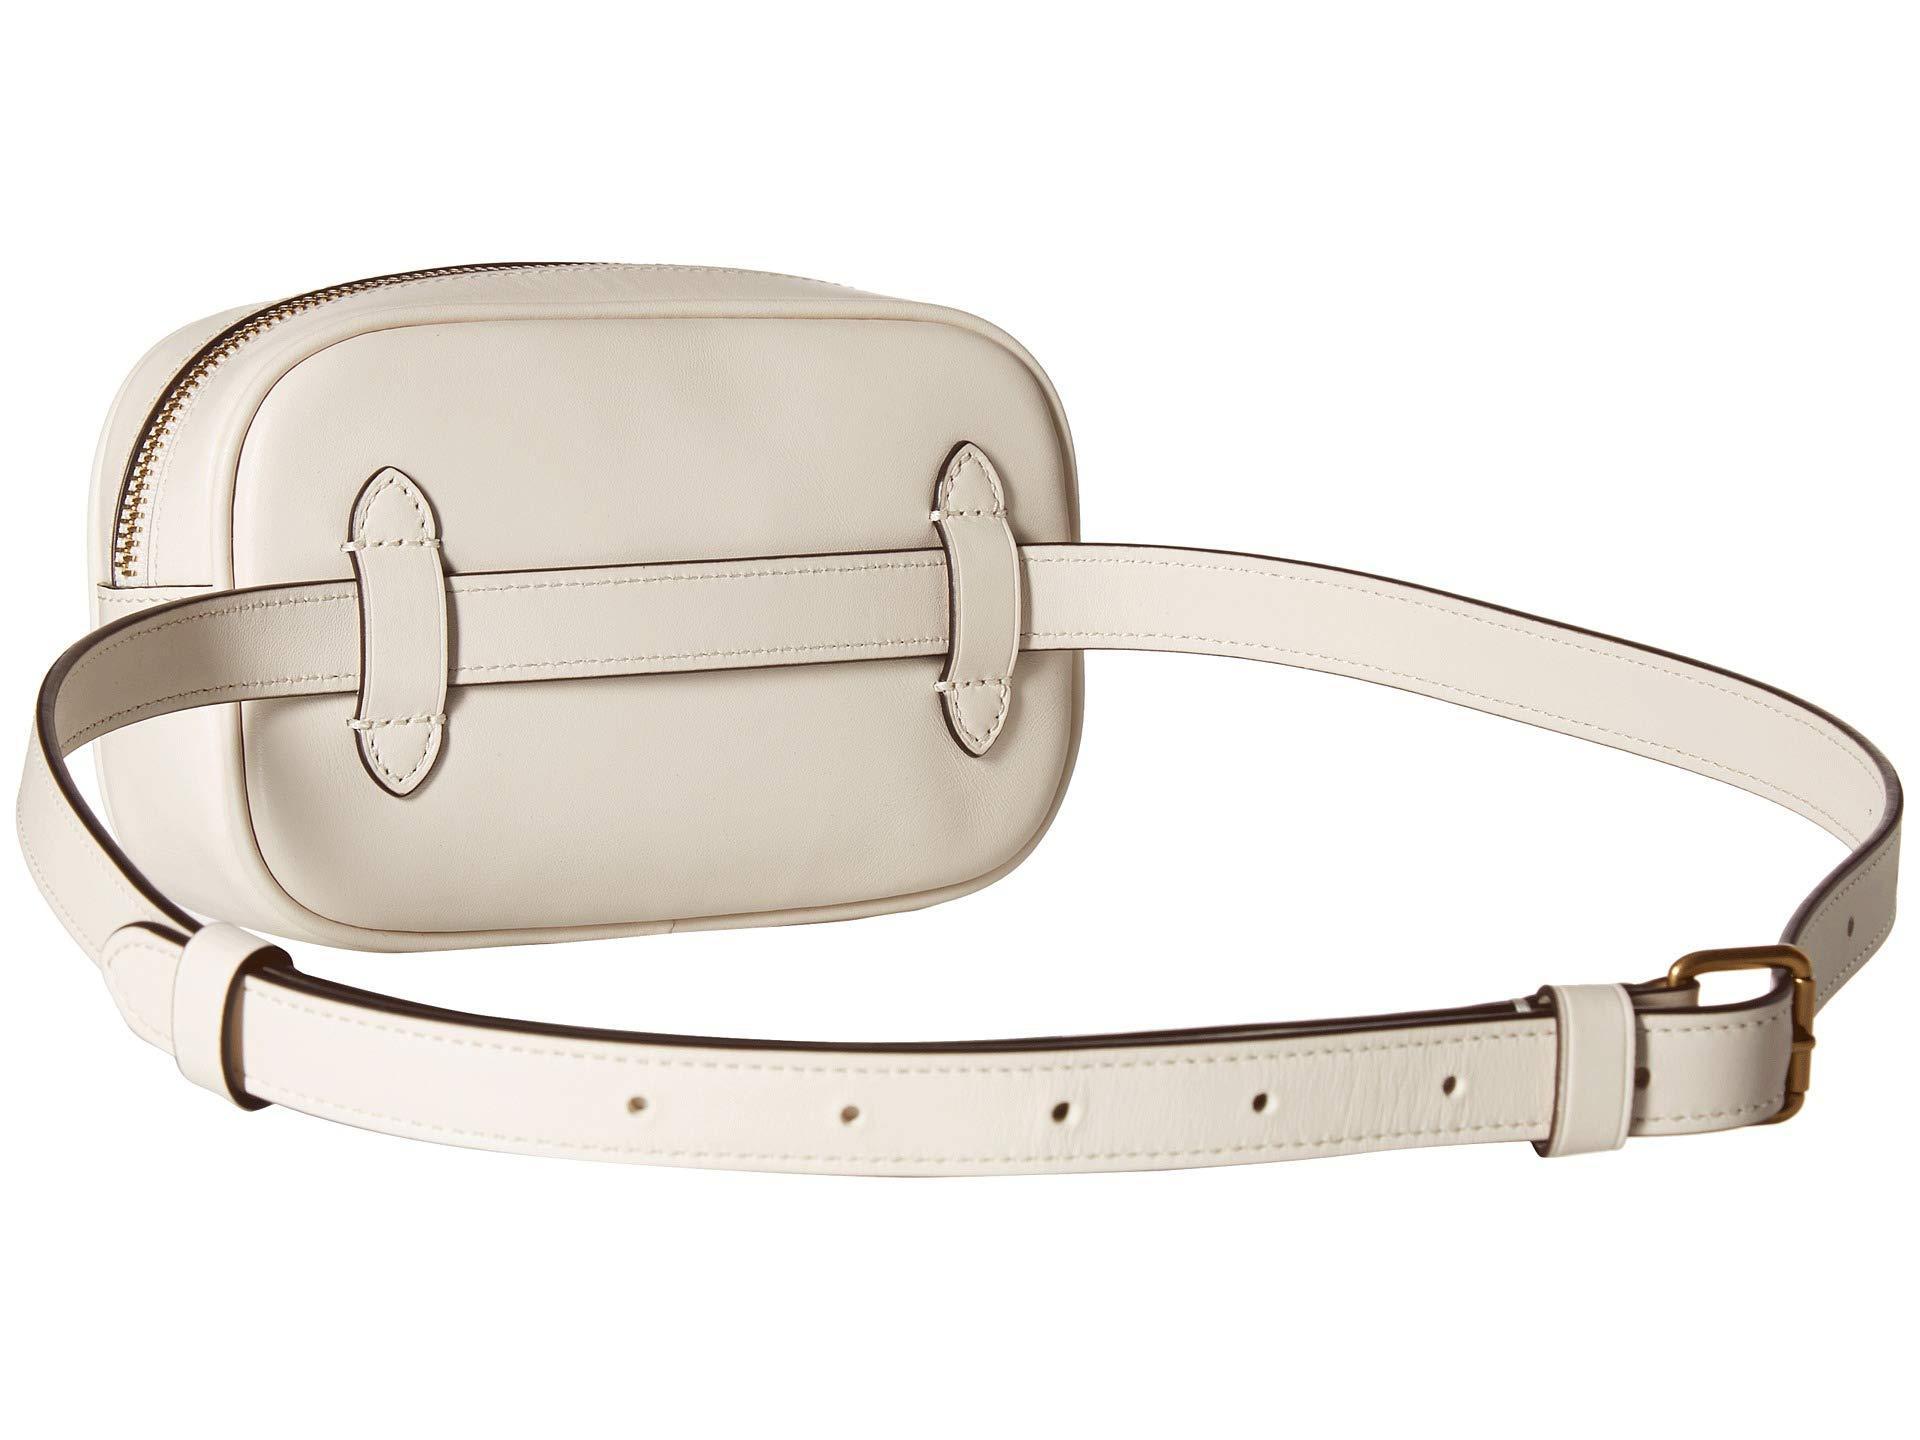 5f711ab819 COACH Ott Scatter Rivets Dressy Belt Bag in Pink - Lyst